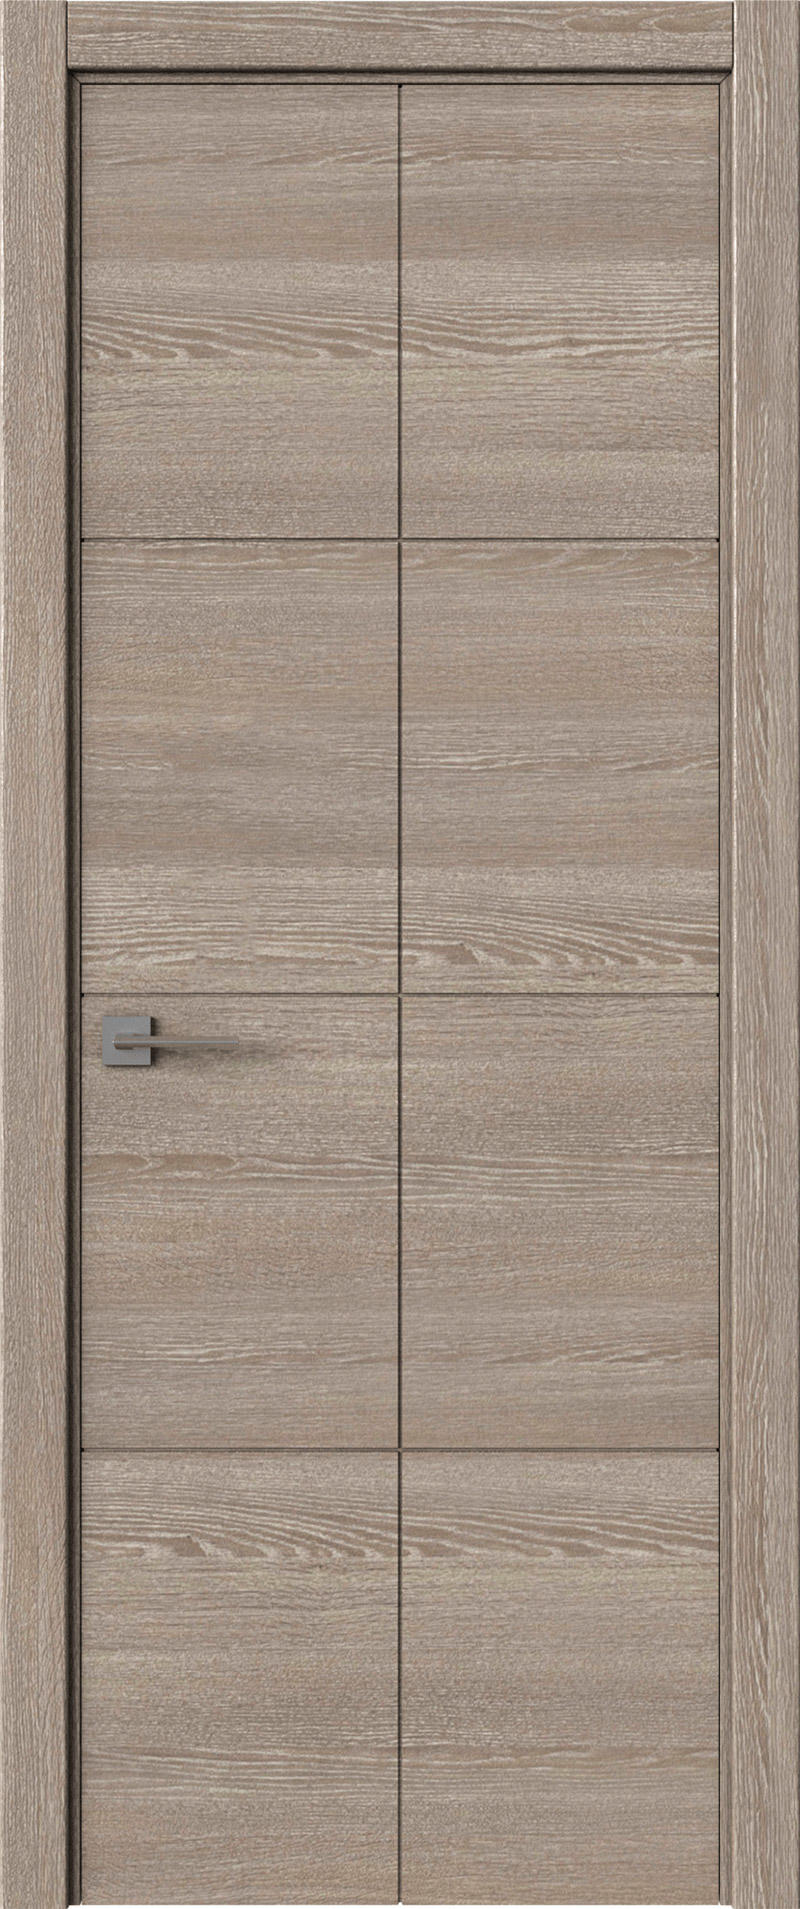 Tivoli Л-2 цвет - Серый дуб Без стекла (ДГ)